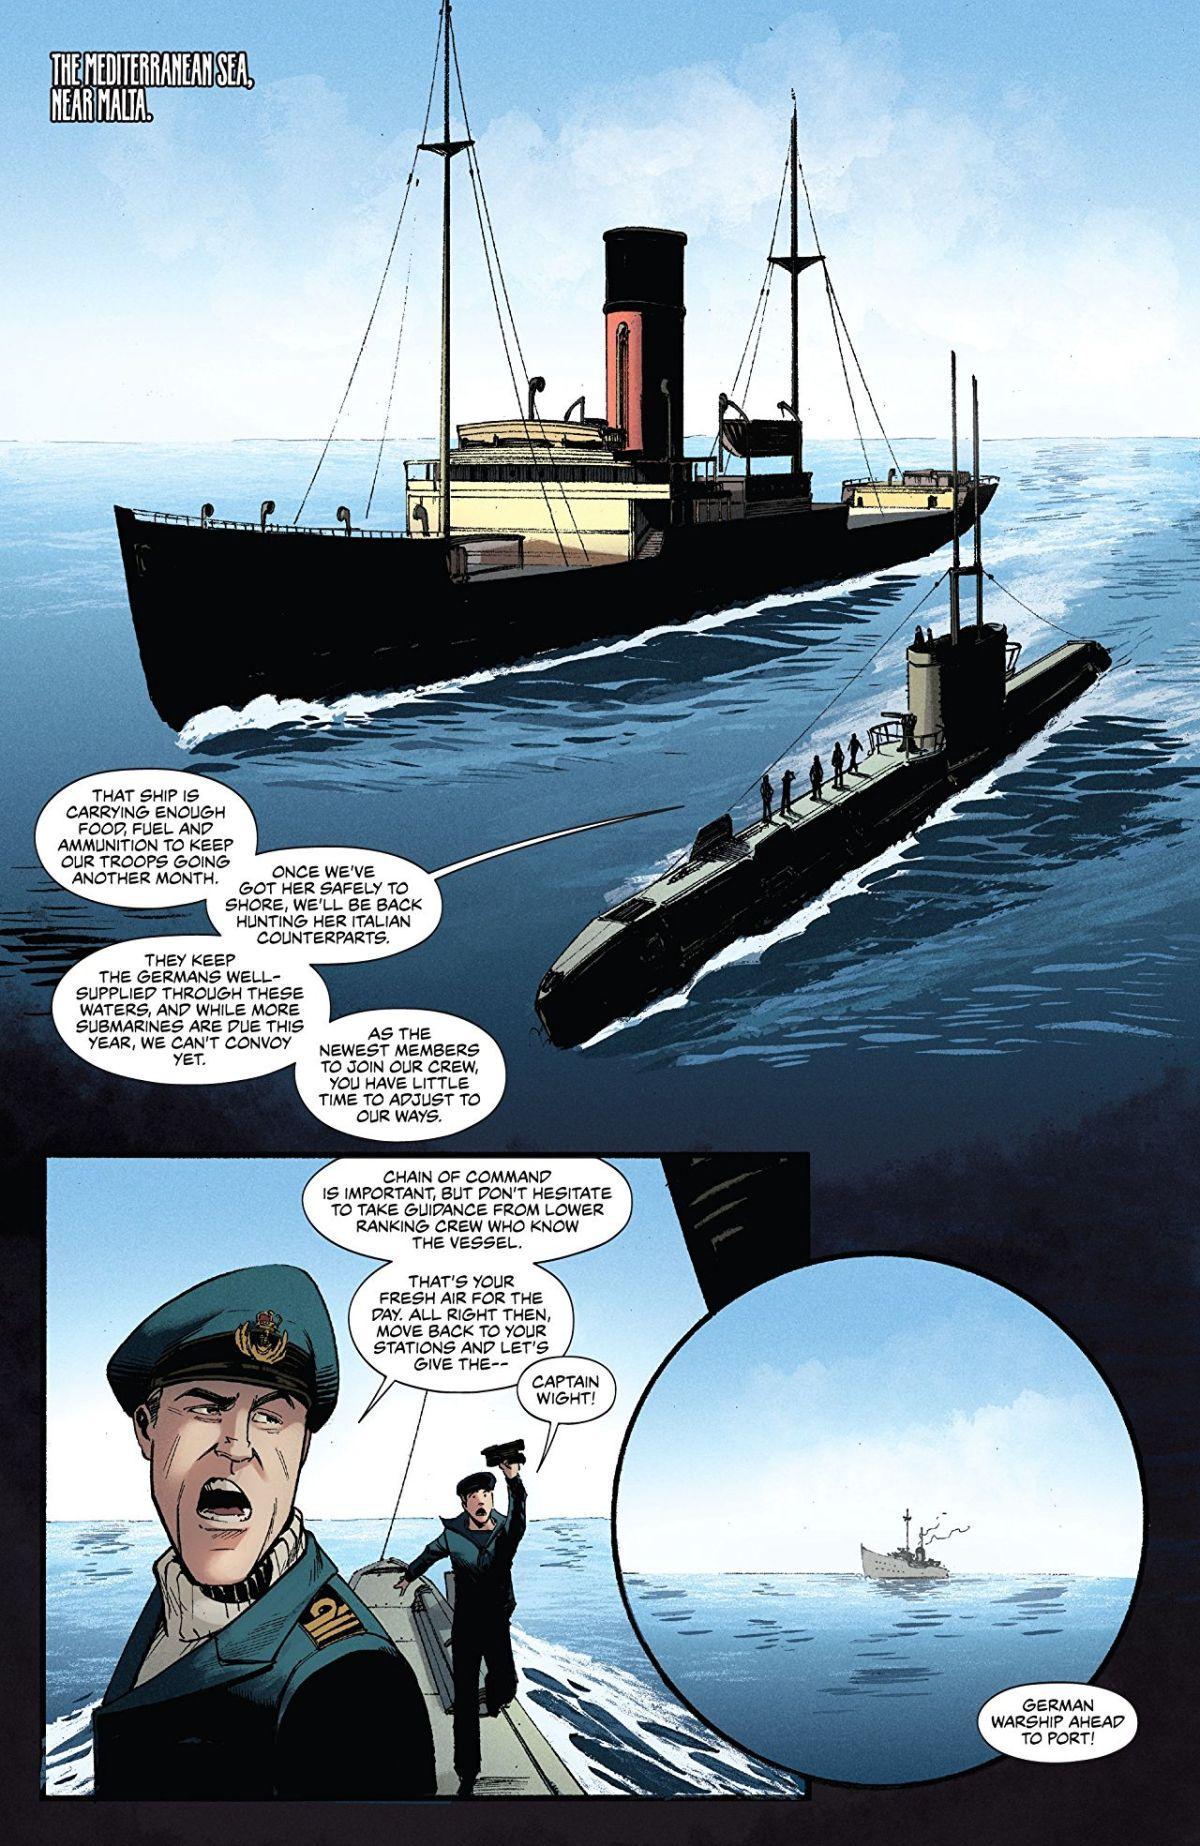 James Bond Origin Overview Of A Notable Spy Thriller Comics 6